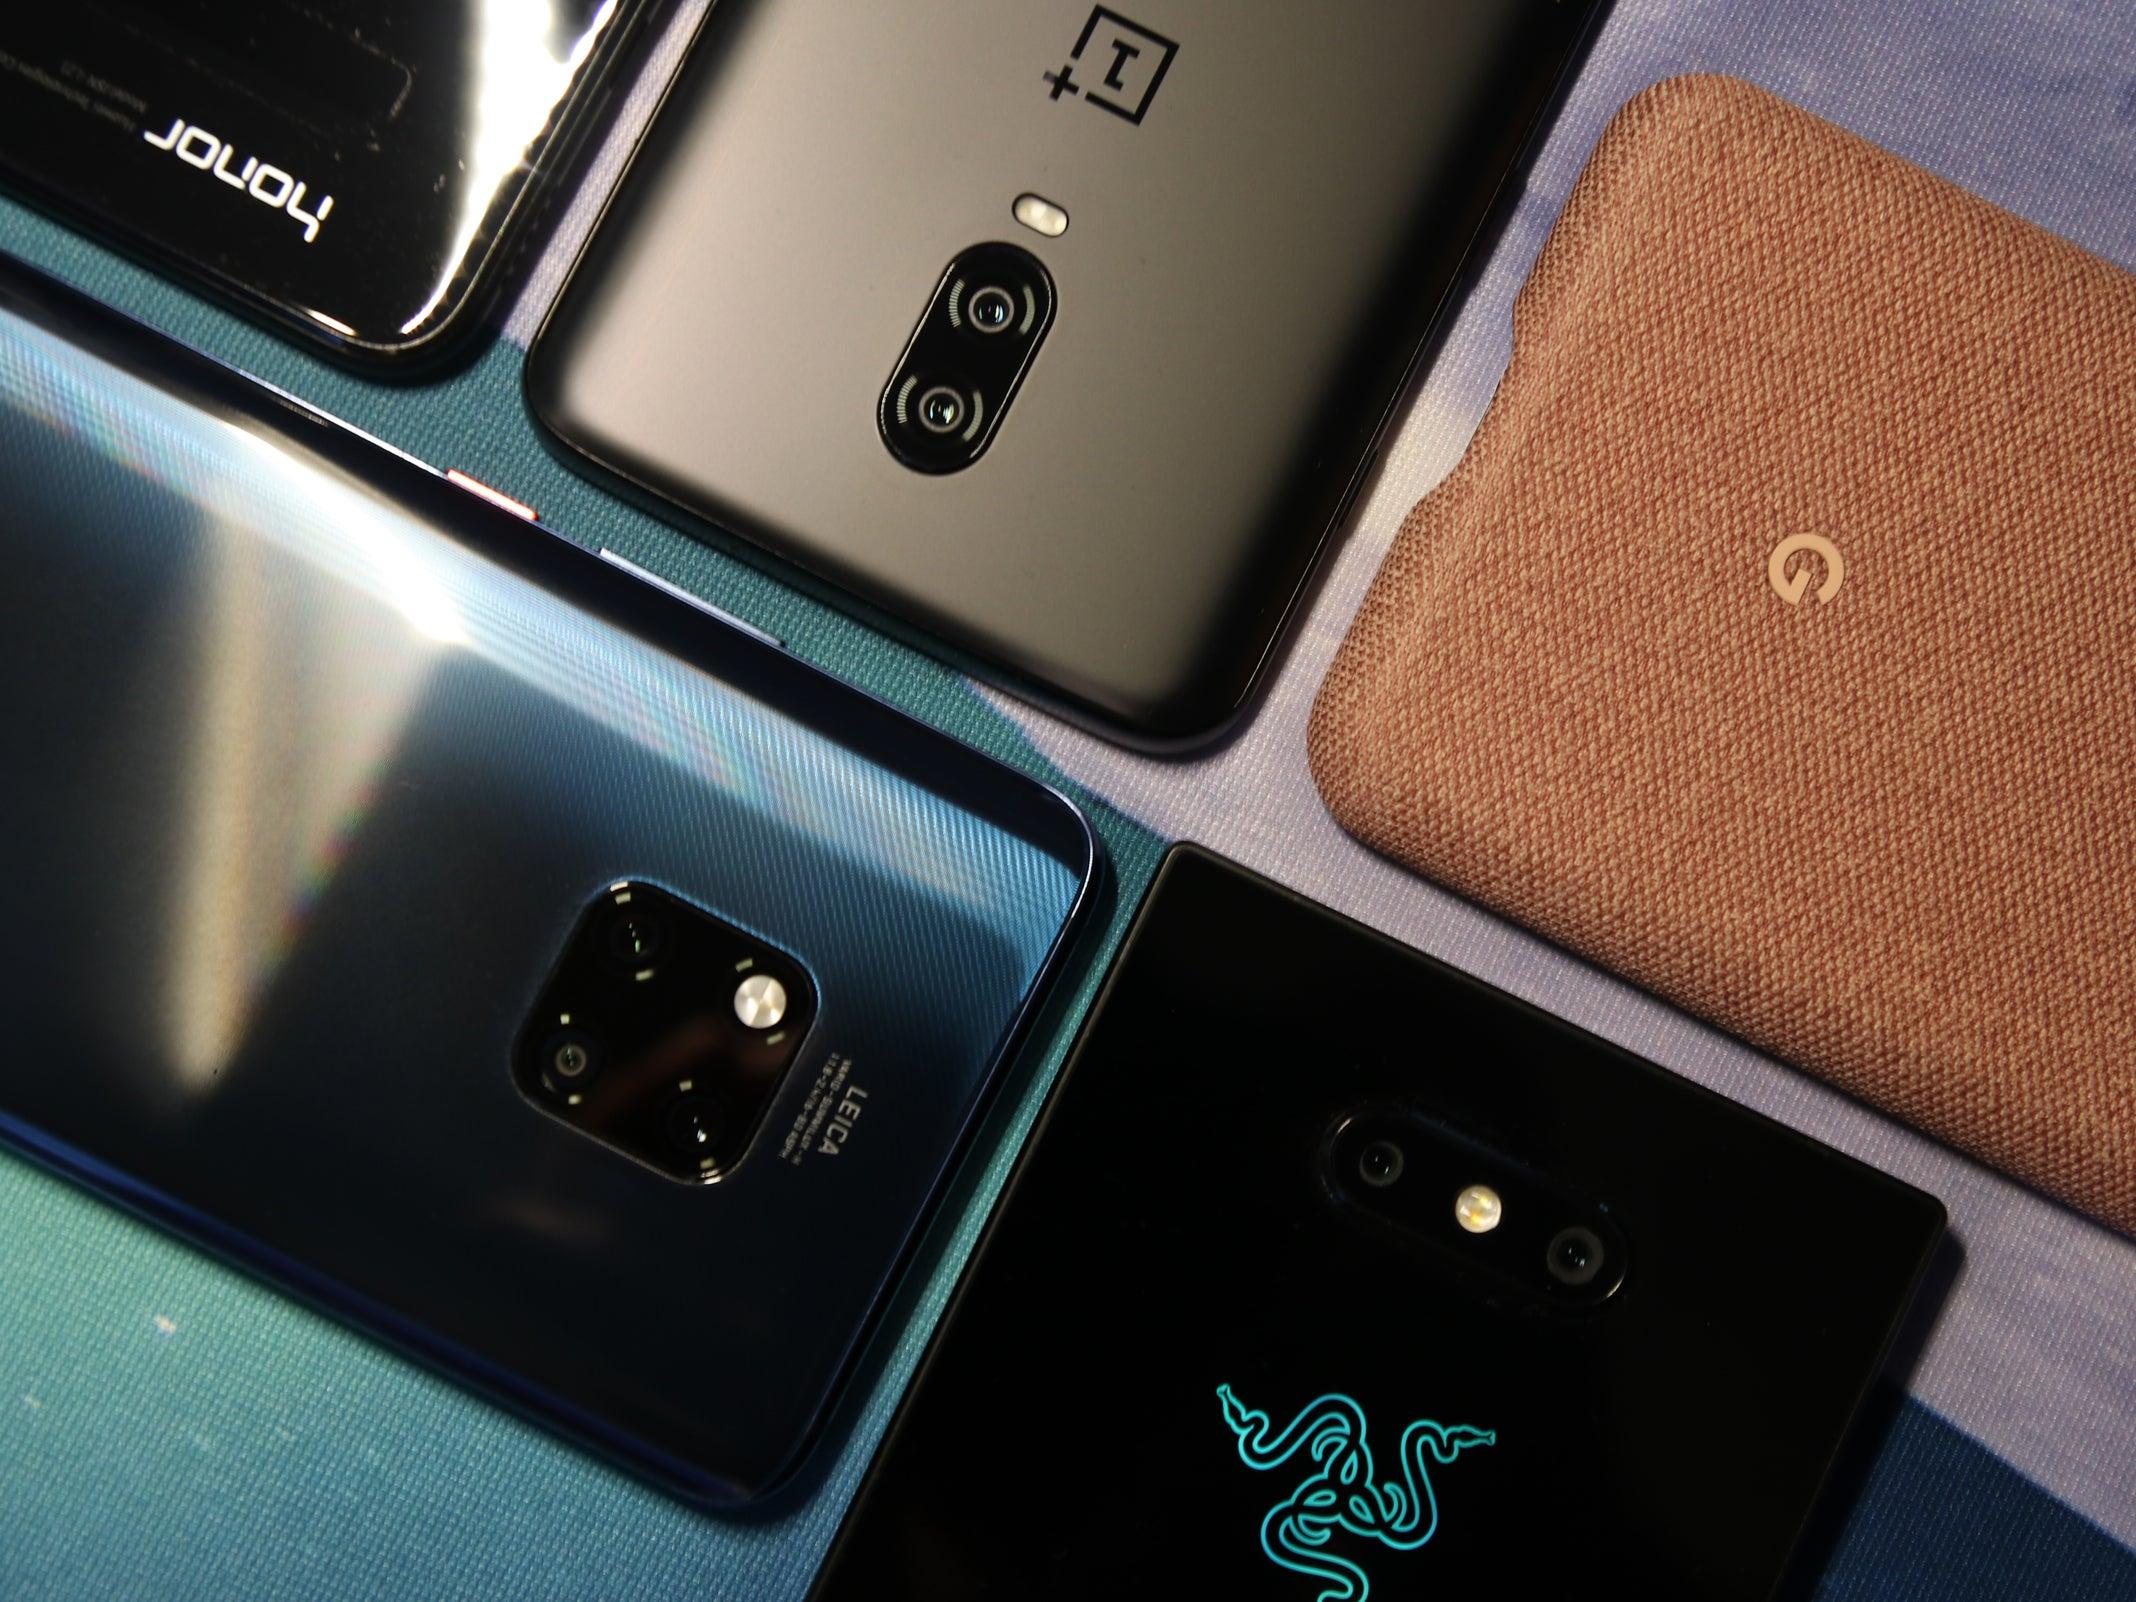 Huawei Mate 20 Pro, Razer Phone 2, Google Pixel 3 XL, OnePlus 6T und Honor 8X